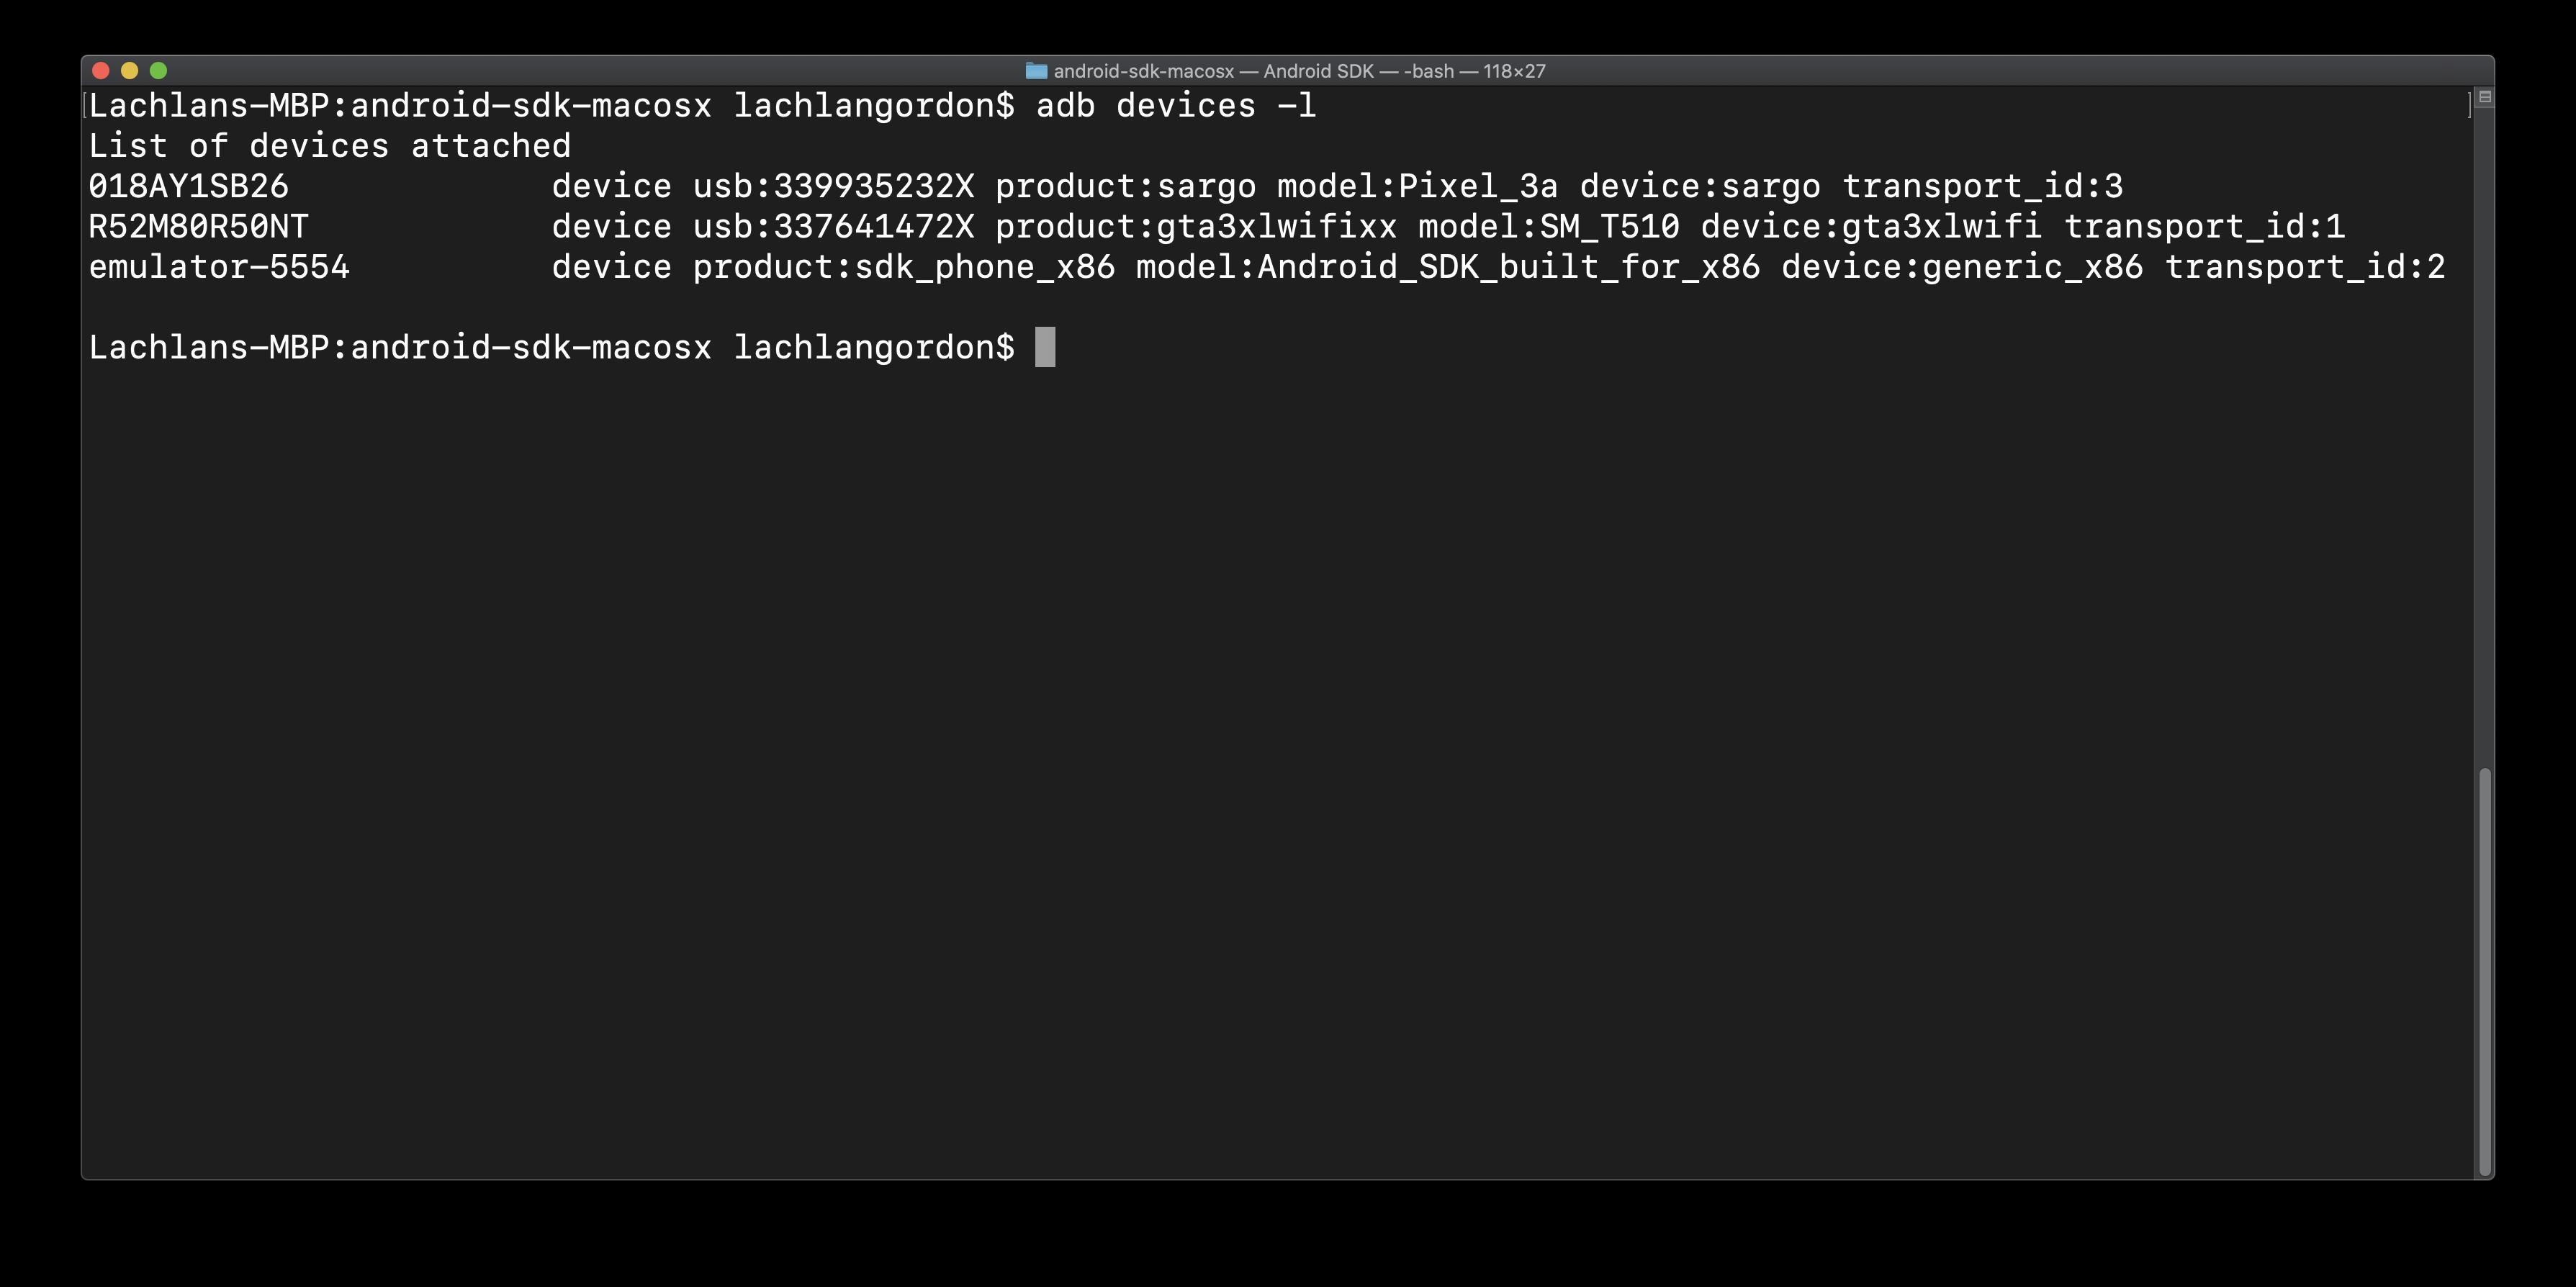 result of running adb devices -l